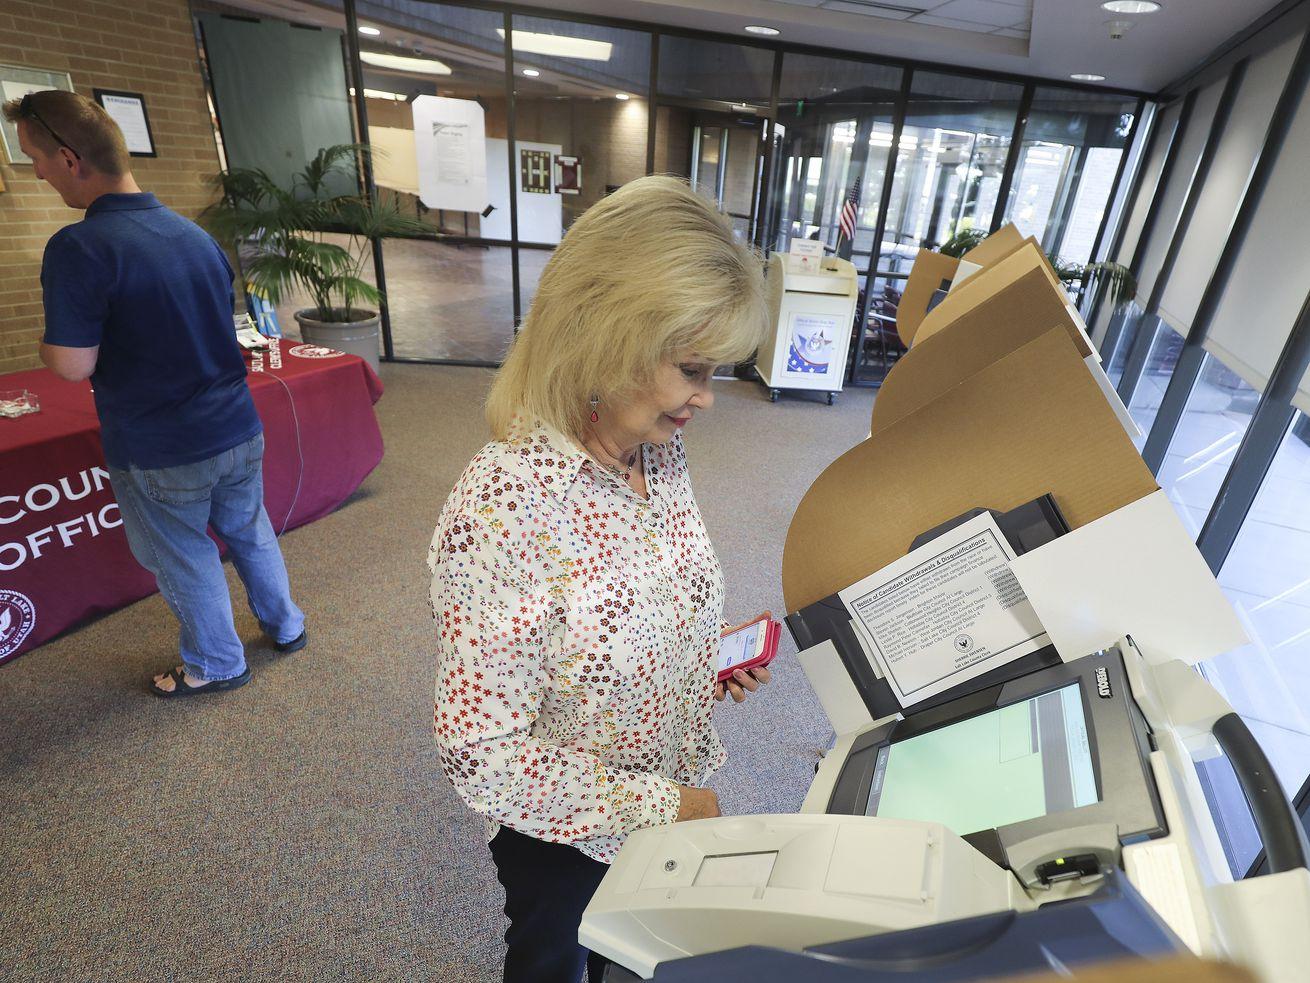 Sherrie Swensen, Salt Lake County Clerk, votes at the Salt Lake County Government Center in Salt Lake City on Tuesday, Aug. 13, 2019.